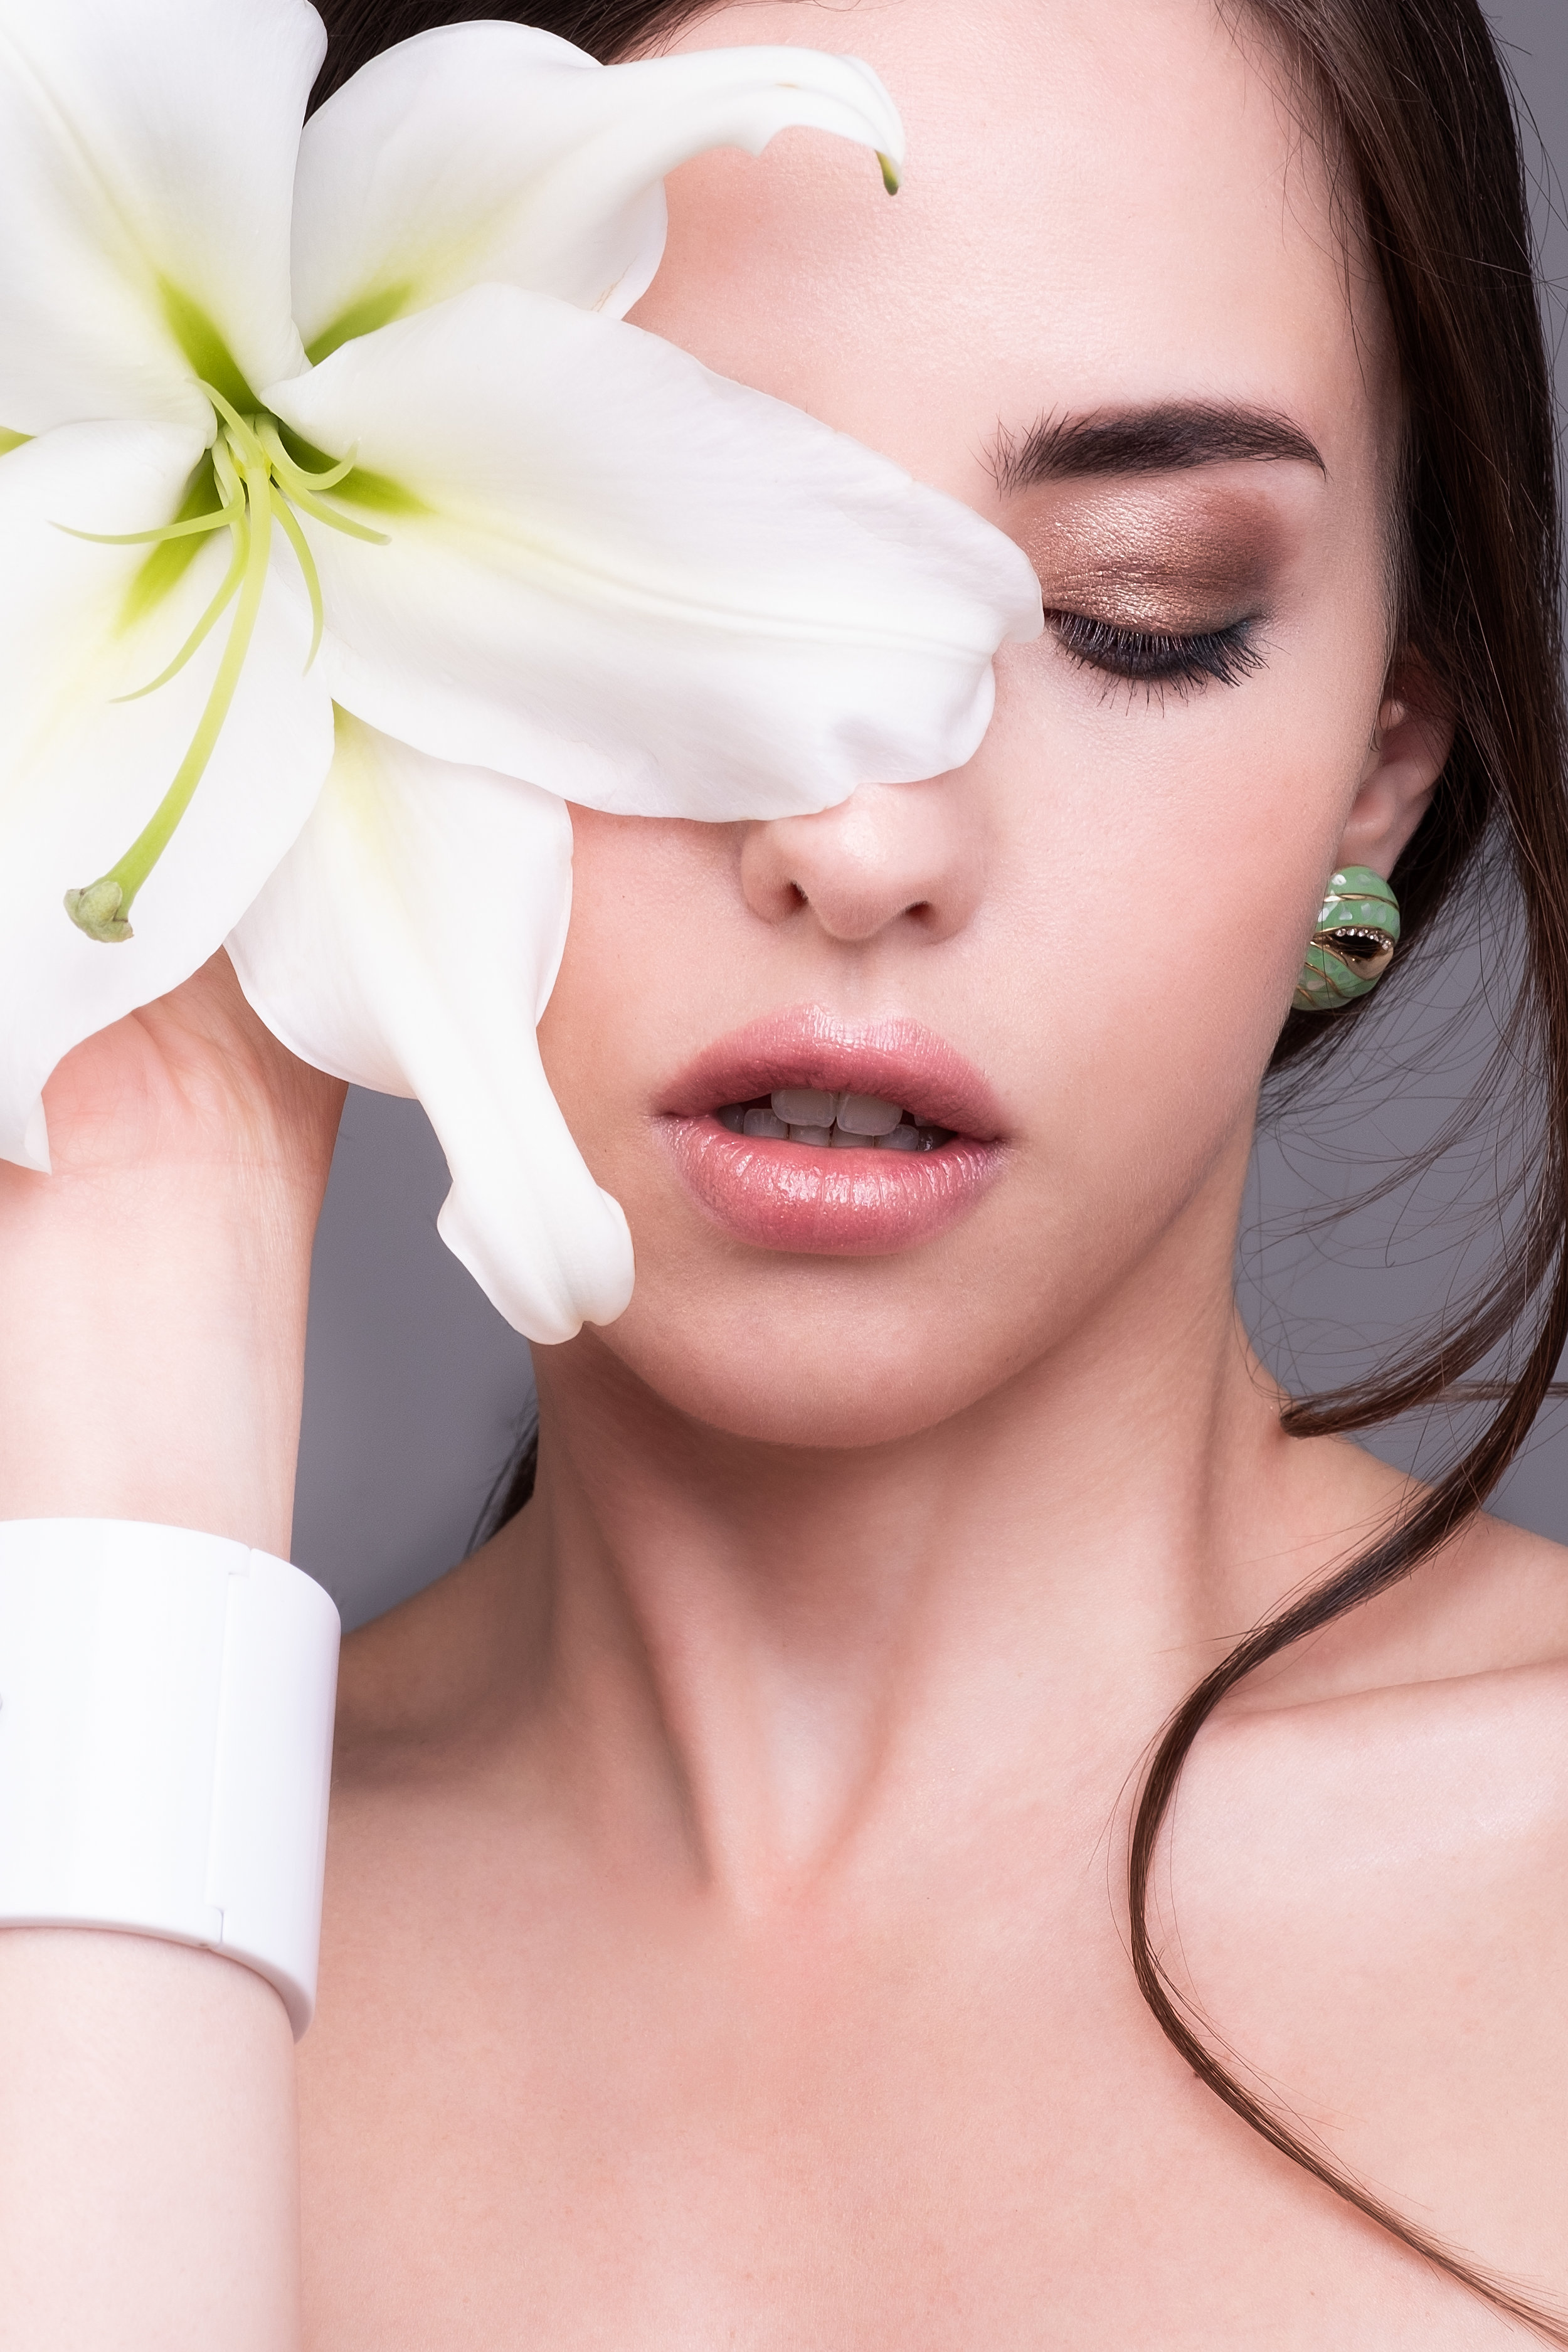 FLOWERS BEAUTY - SHEEBA MAGAZINE  Model: Giusy Reina - MUA/Hair/Concept Eleonora Eilythia